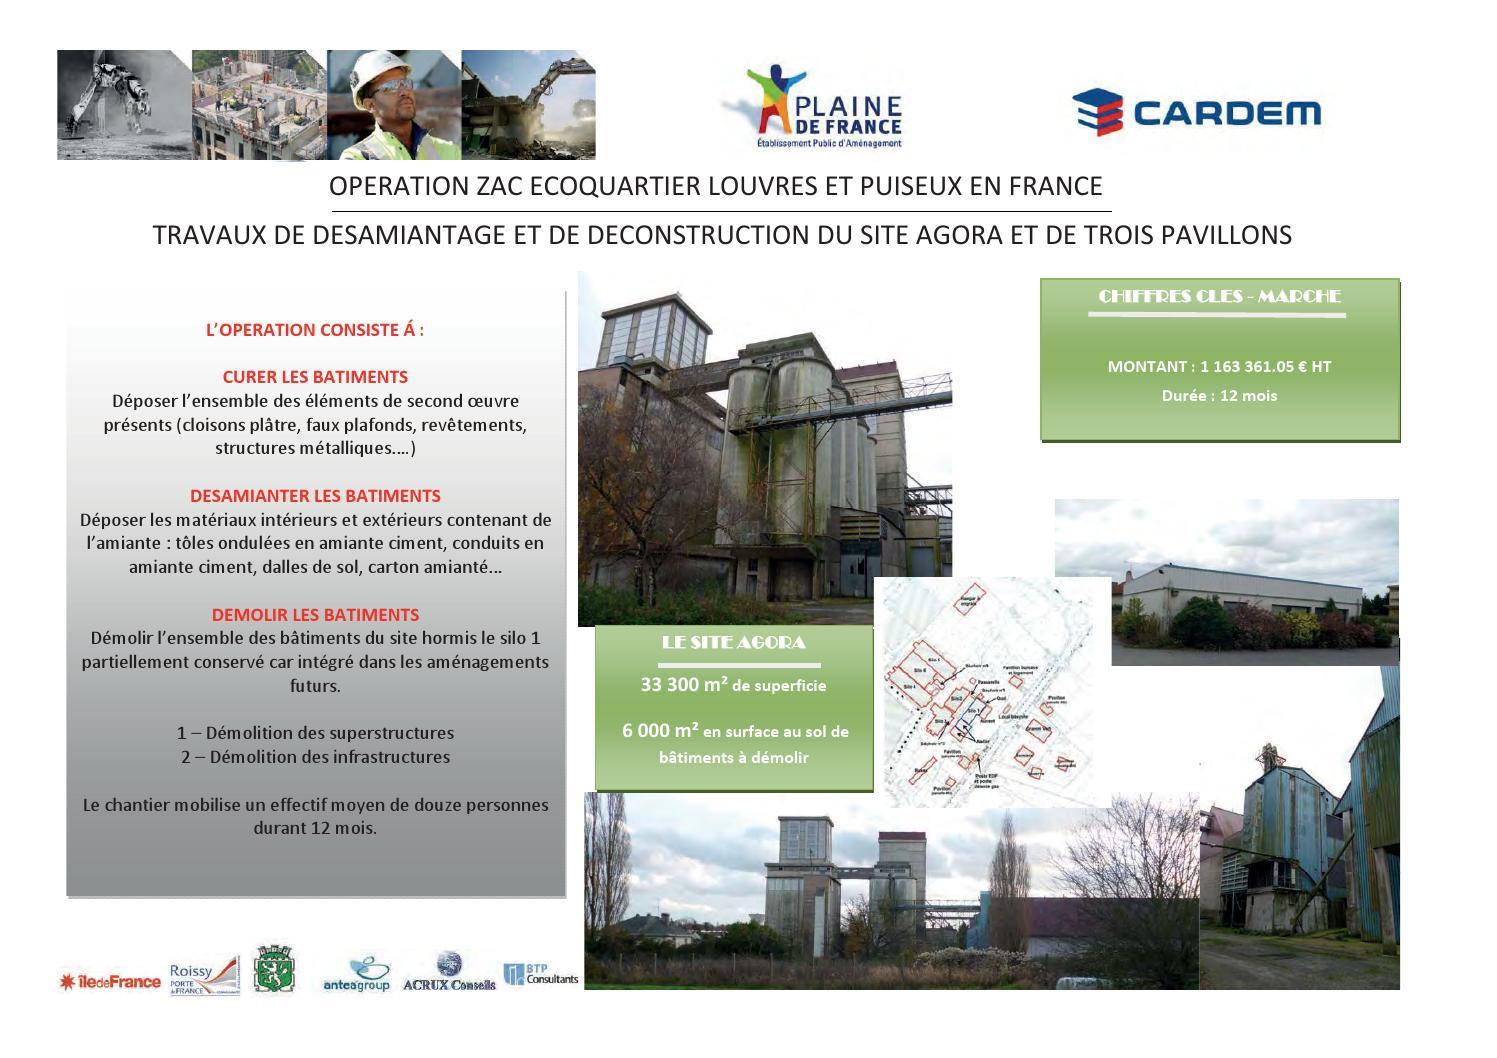 Panneaux Explicatifs Chantier Demolition By Marion Dache - Issuu destiné Echafaudage Gamm Vert